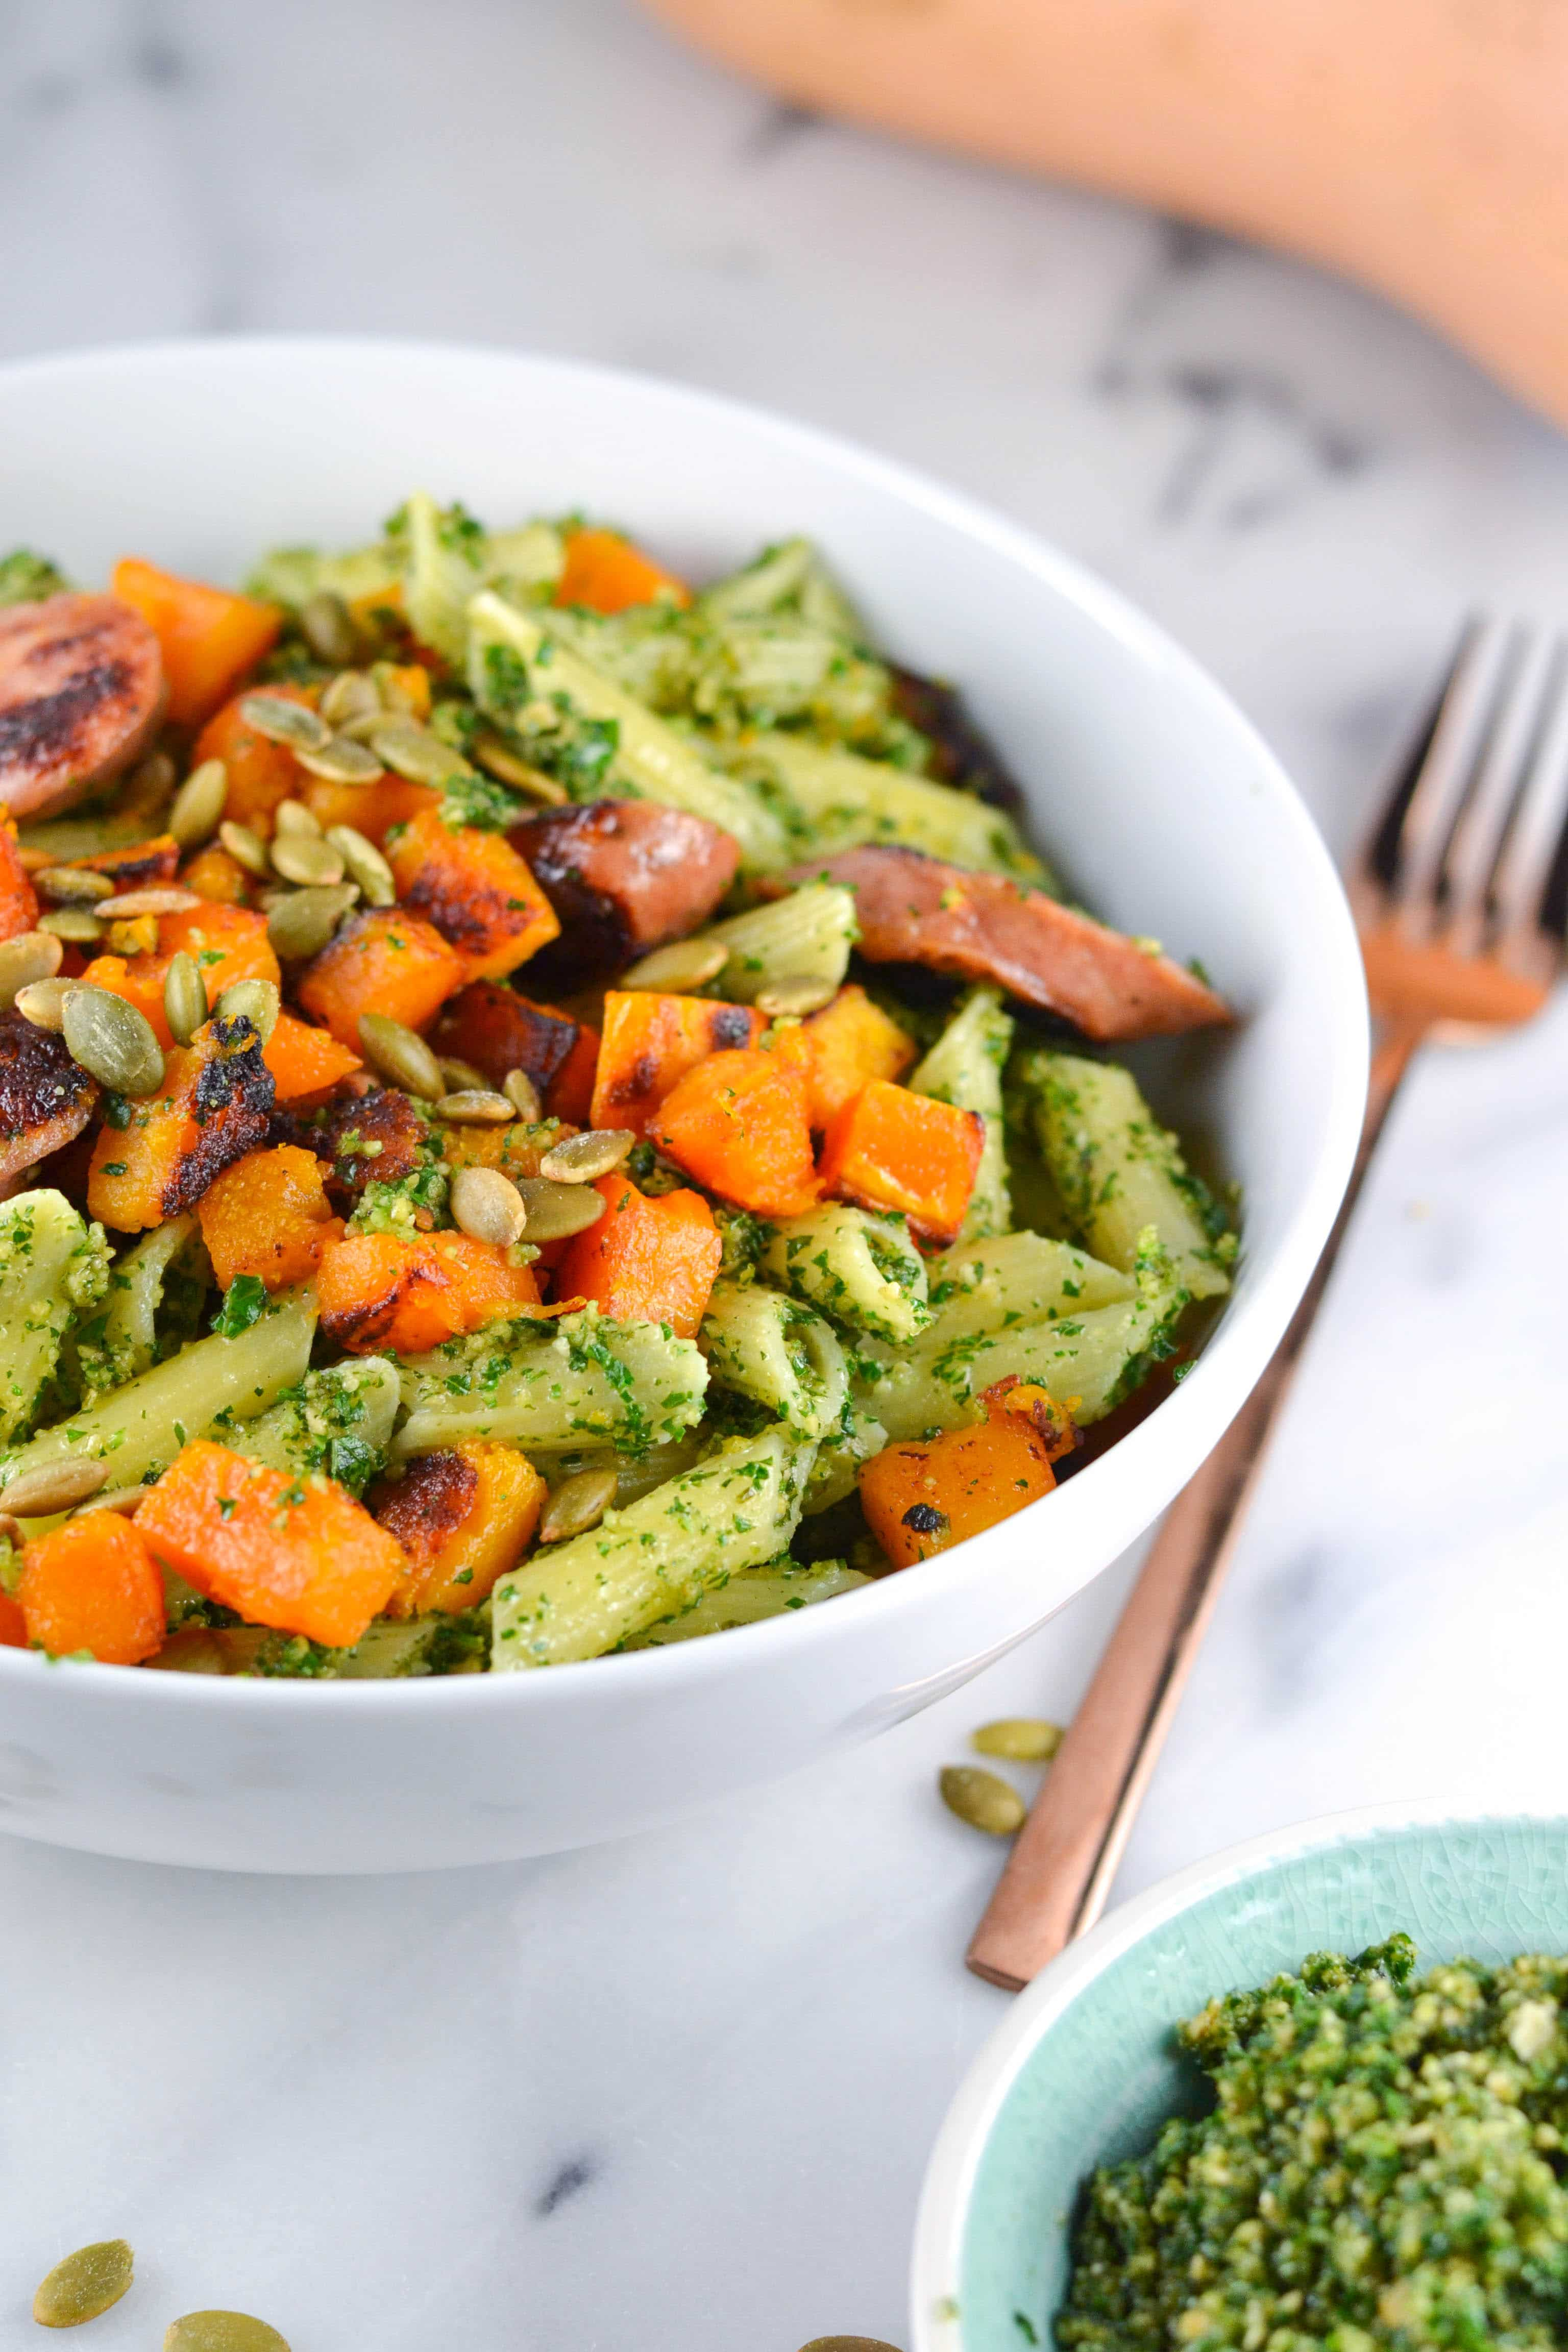 Gluten-Free Pumpkin Seed Pesto Pasta with Butternut Squash (GF, DF) - A Dash of Megnut